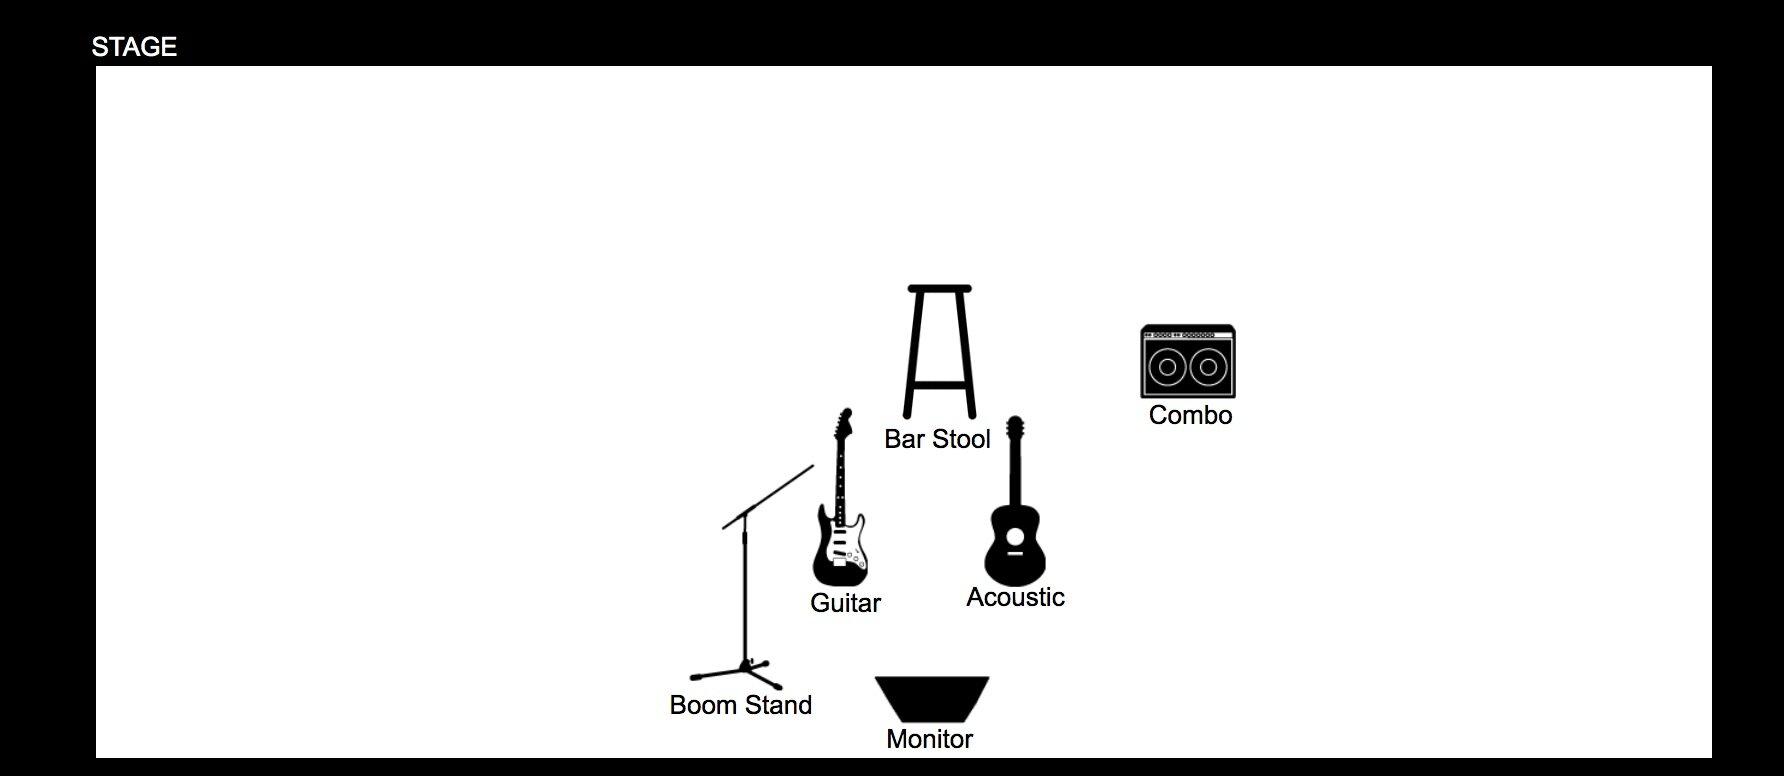 Sennheiser 835 Mic (1 vocal mic) Pedal Board (Reverb, Delay, Chorus)  Vox Amp Fender Telecaster Acoustic Guitar (with DI)